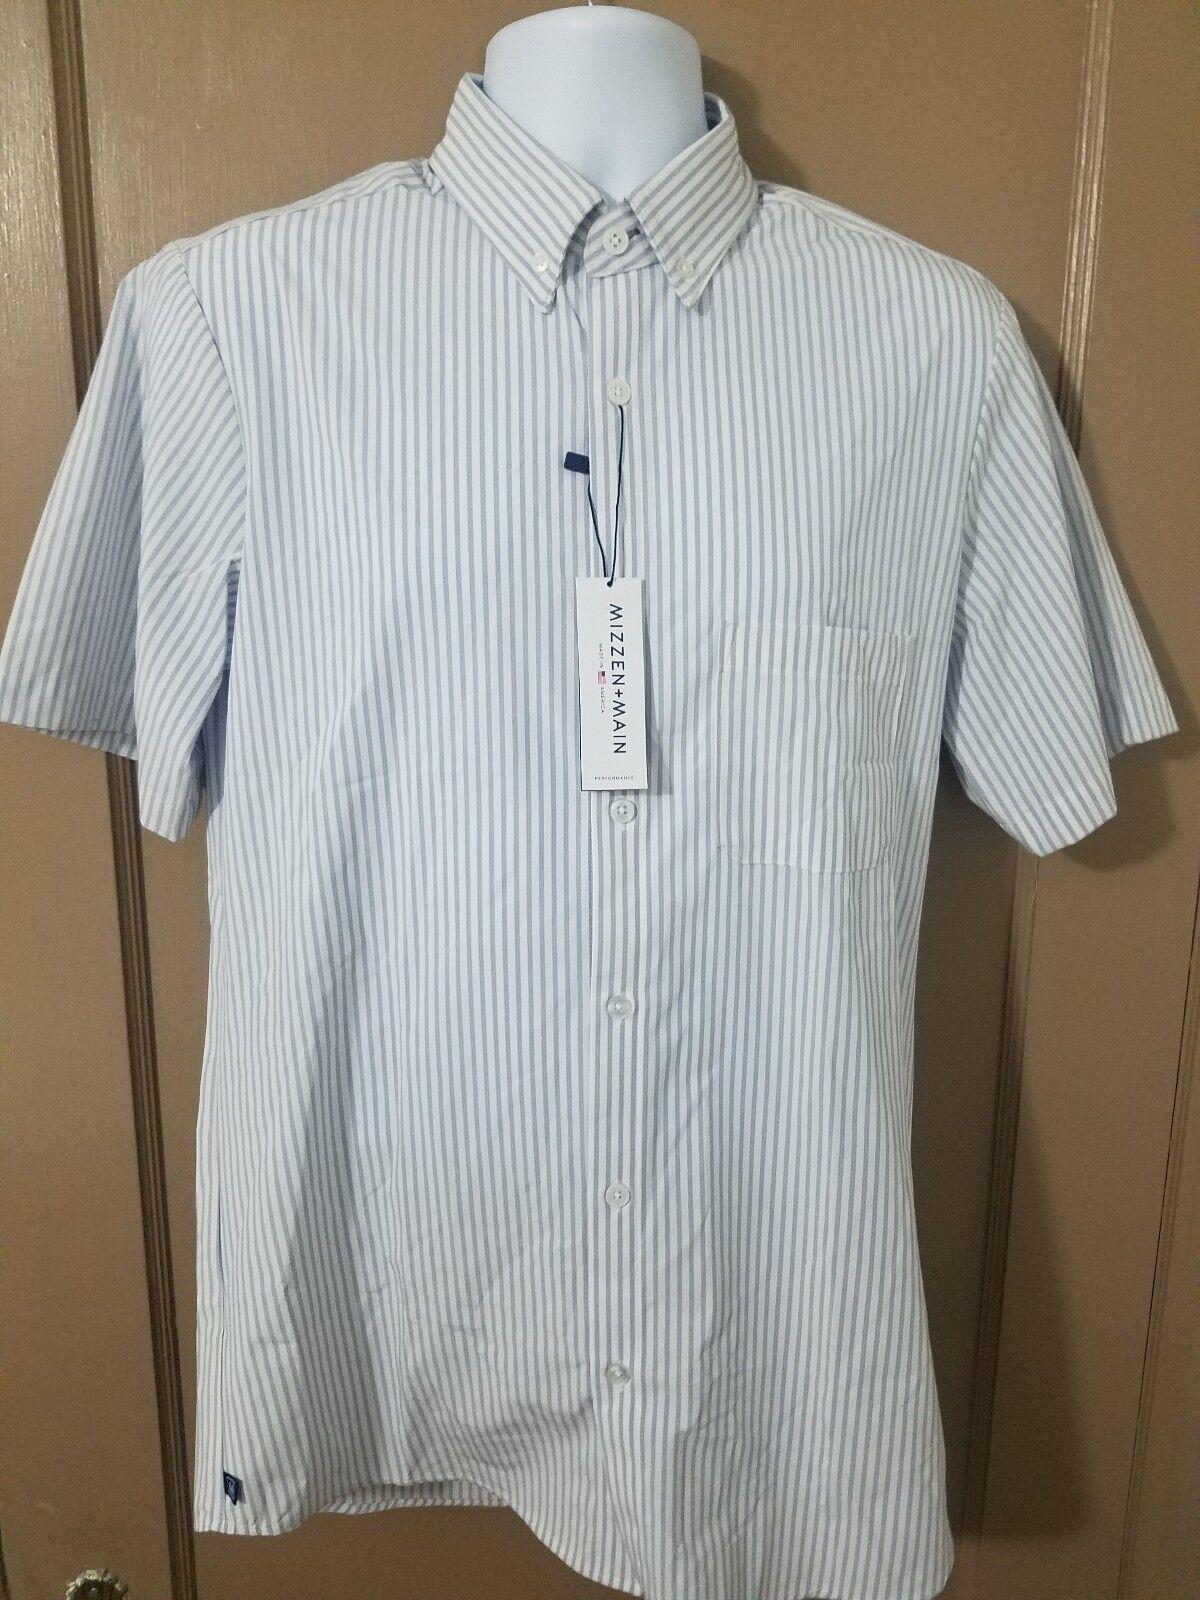 Mizzen+Main Leeward Collection Short Sleeve Medium Trim Fit Shirt striped grey